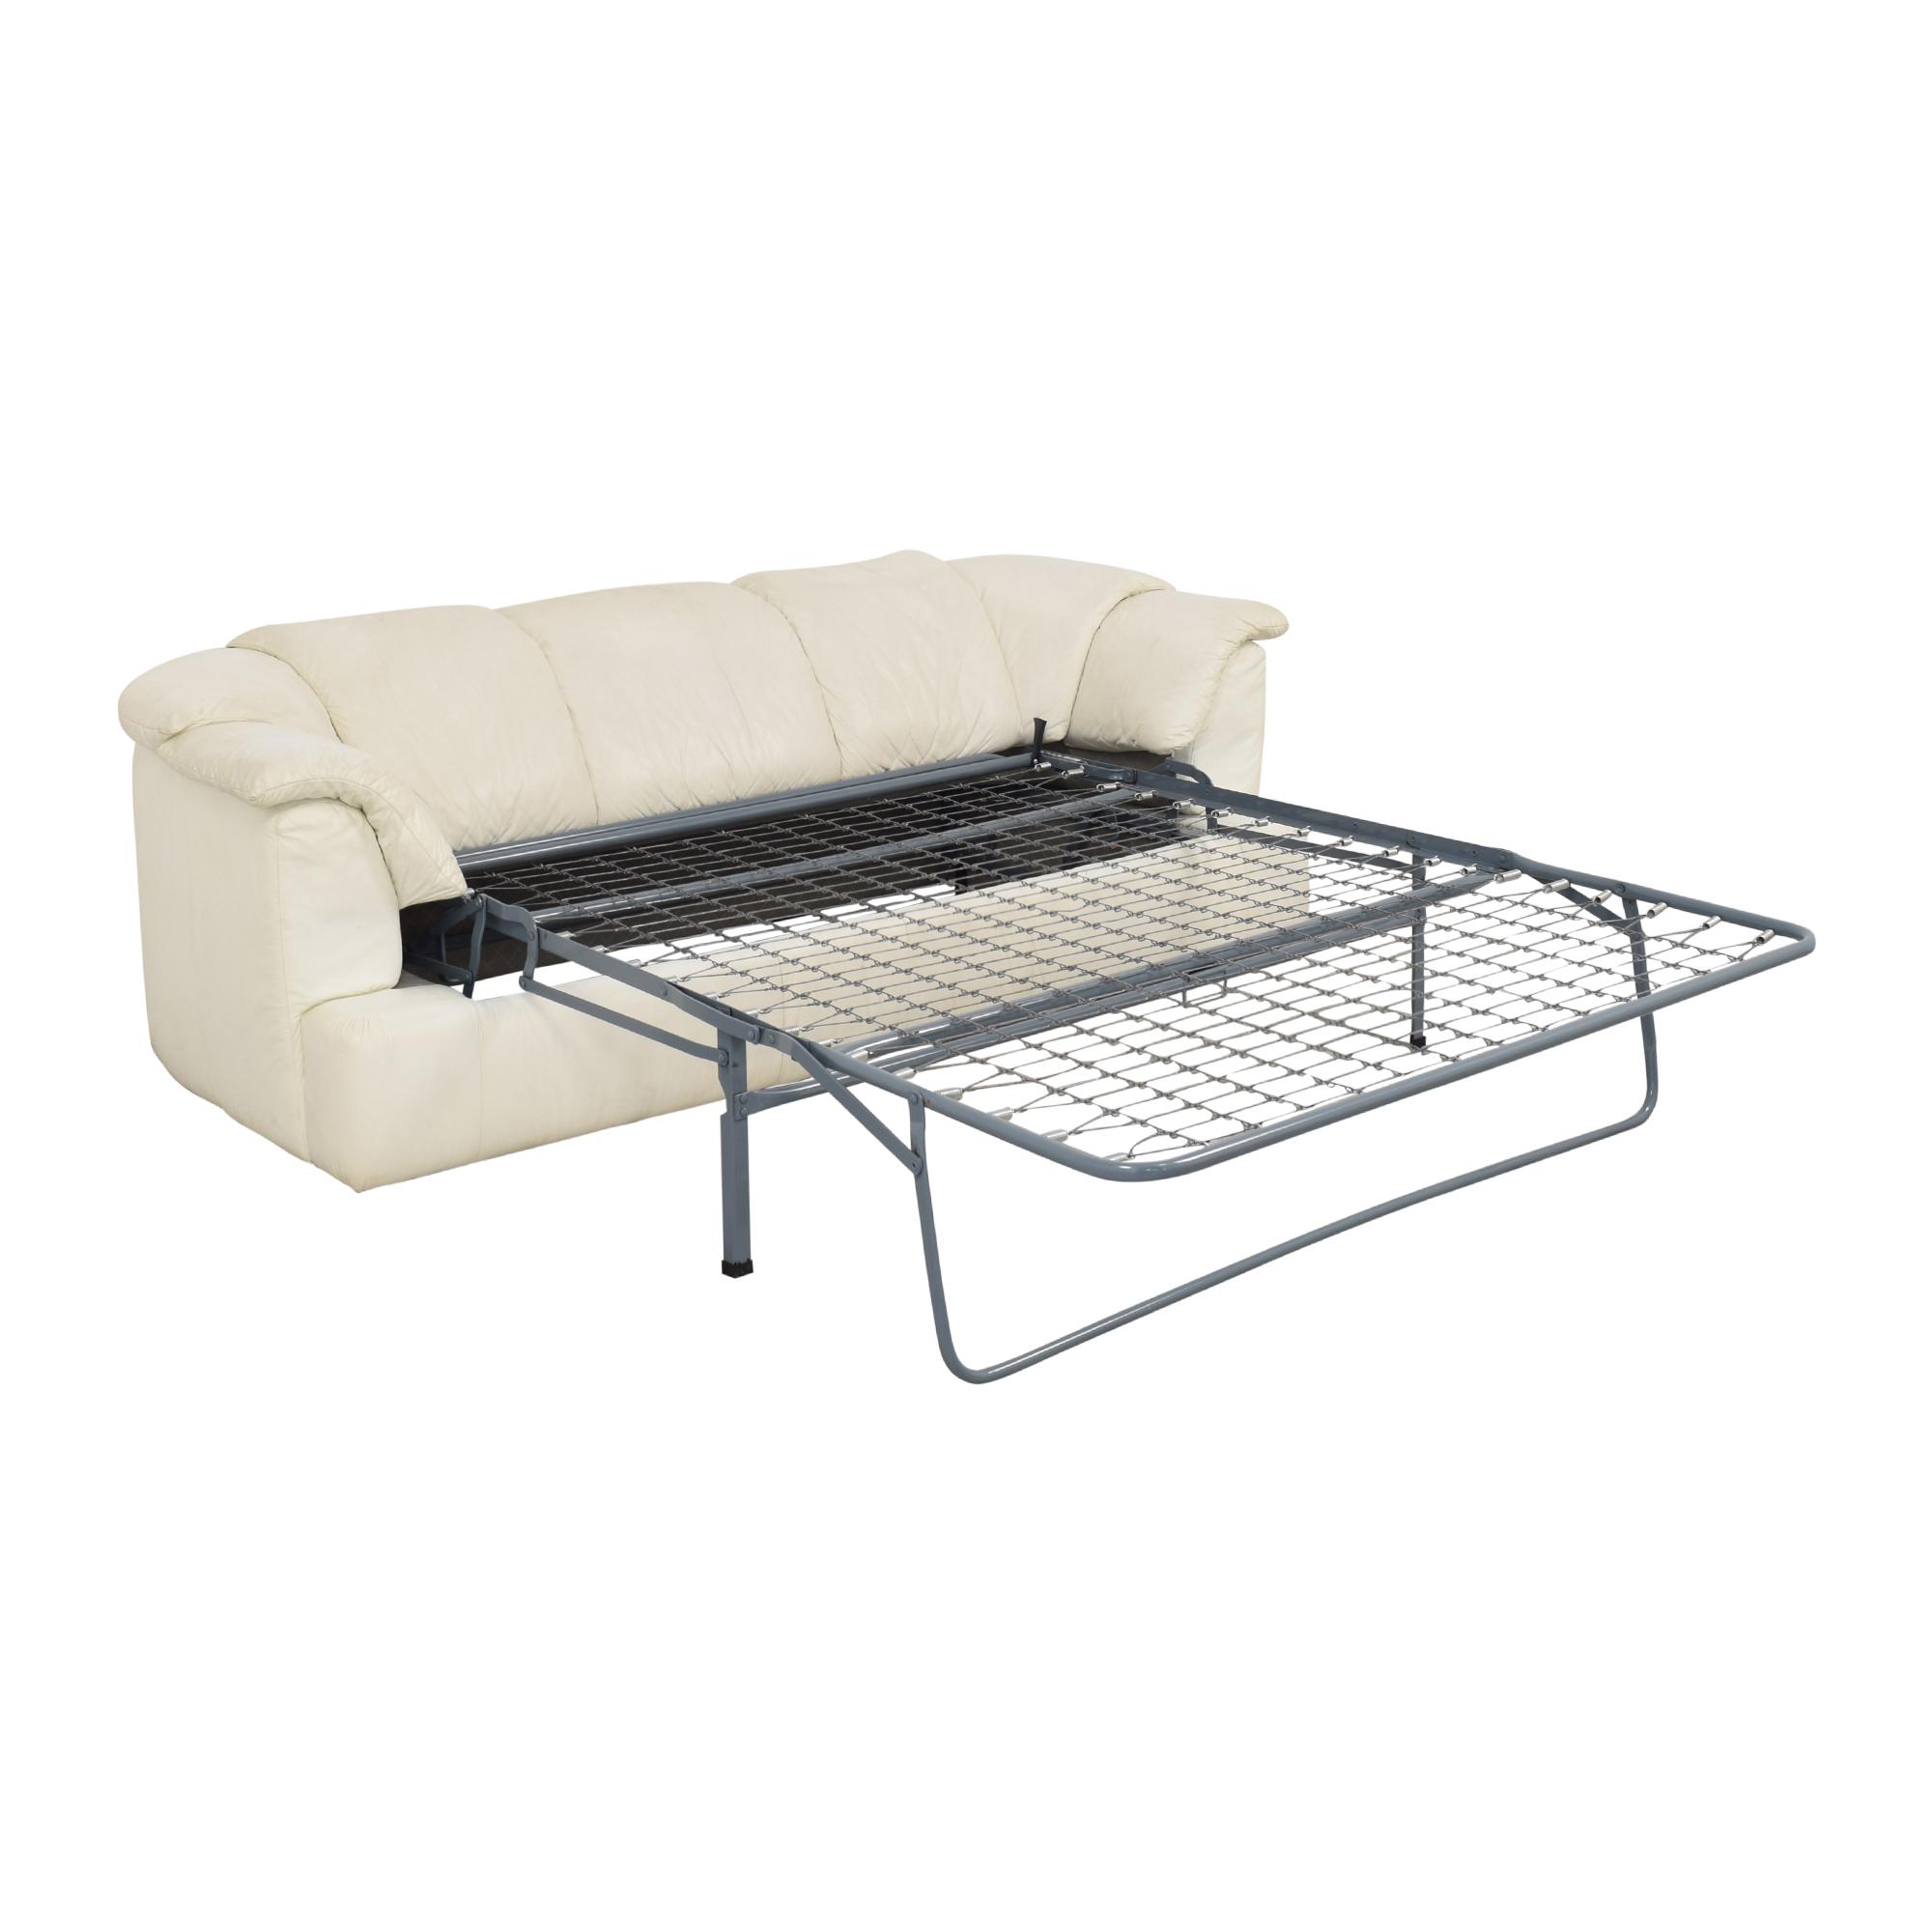 Natuzzi Natuzzi Queen Sofa Bed for sale